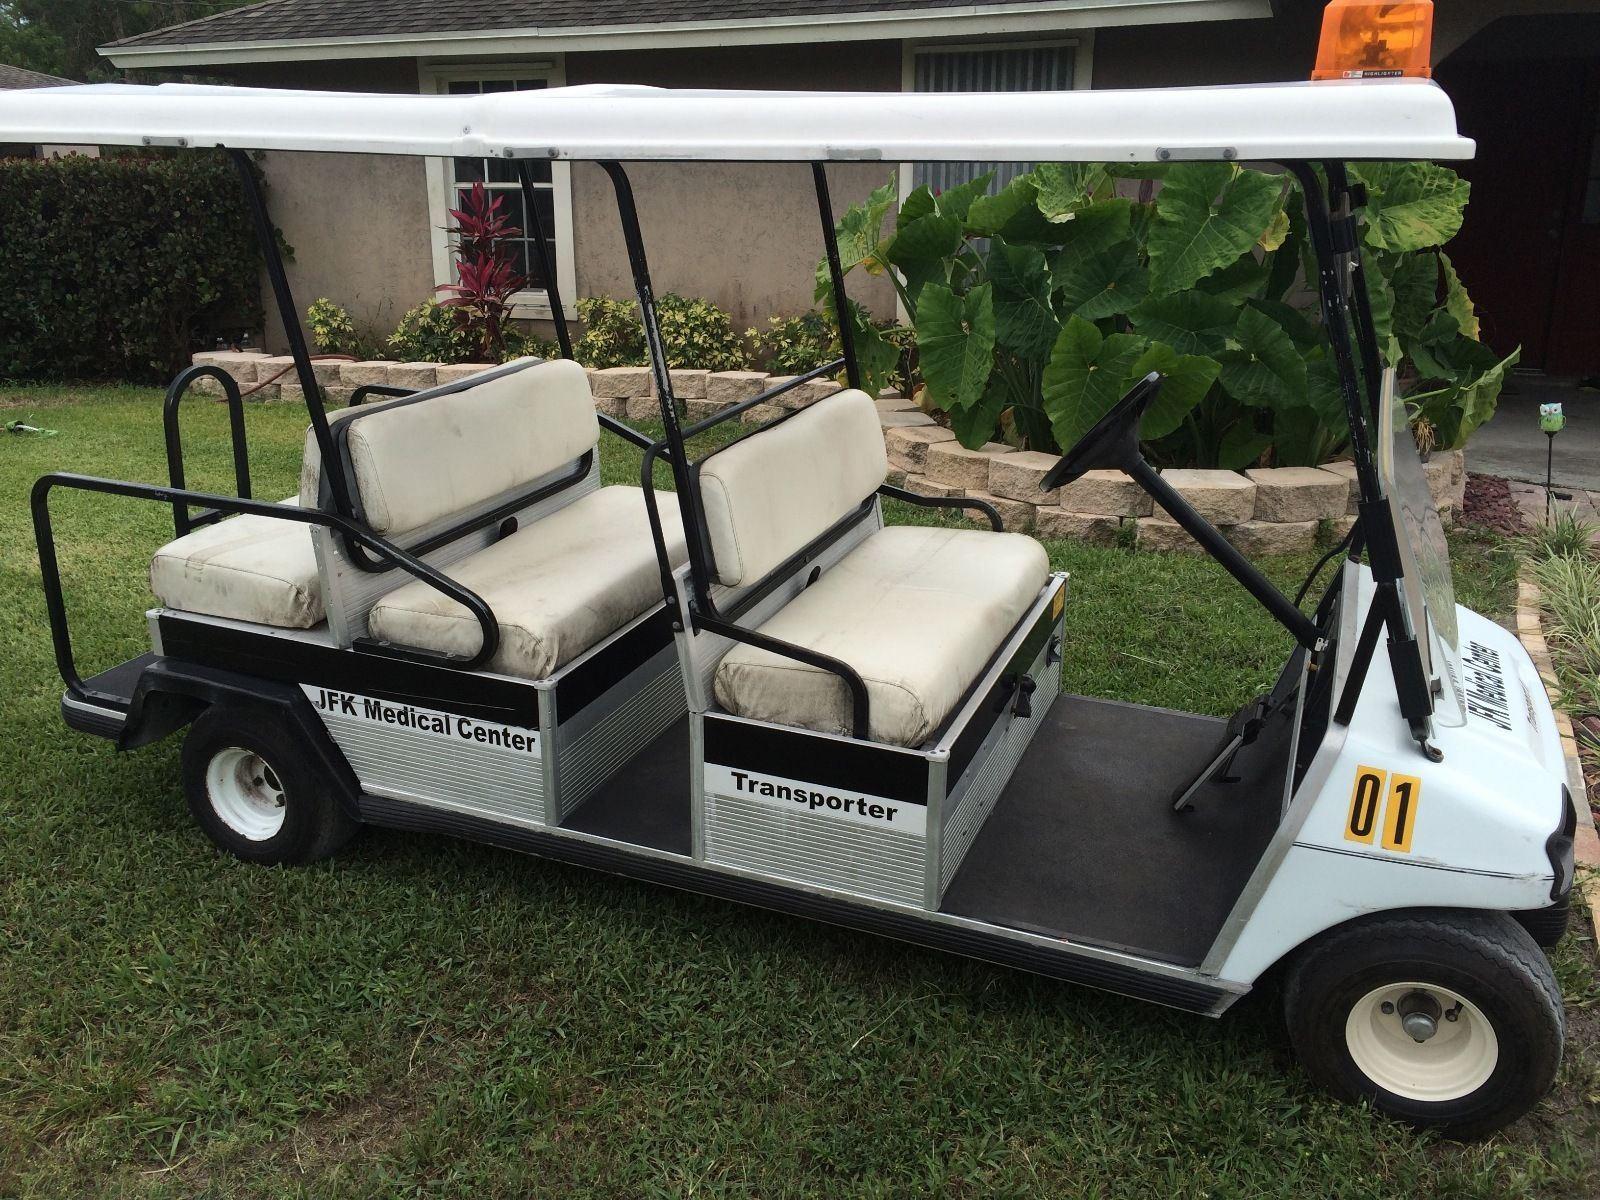 Polaris Gem For Sale >> Club Car DS 48 volt, 6 seater transporter cart for sale